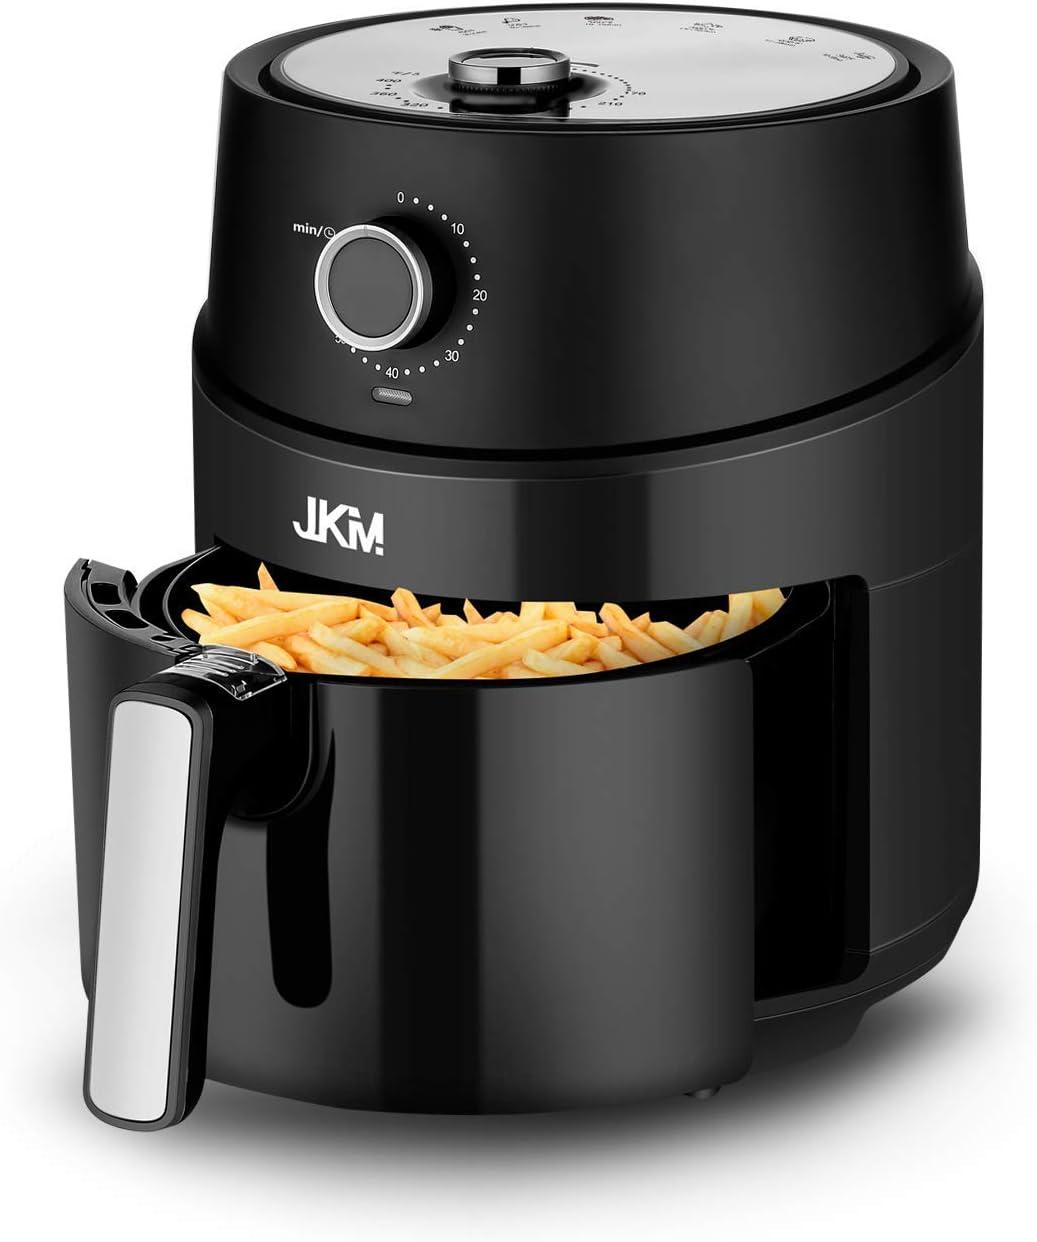 JKM 3.7 Quart Air Fryer Oven 1500W,15 E-Recipes, Control Timer&Temp Knob, Auto Shut Off, Black